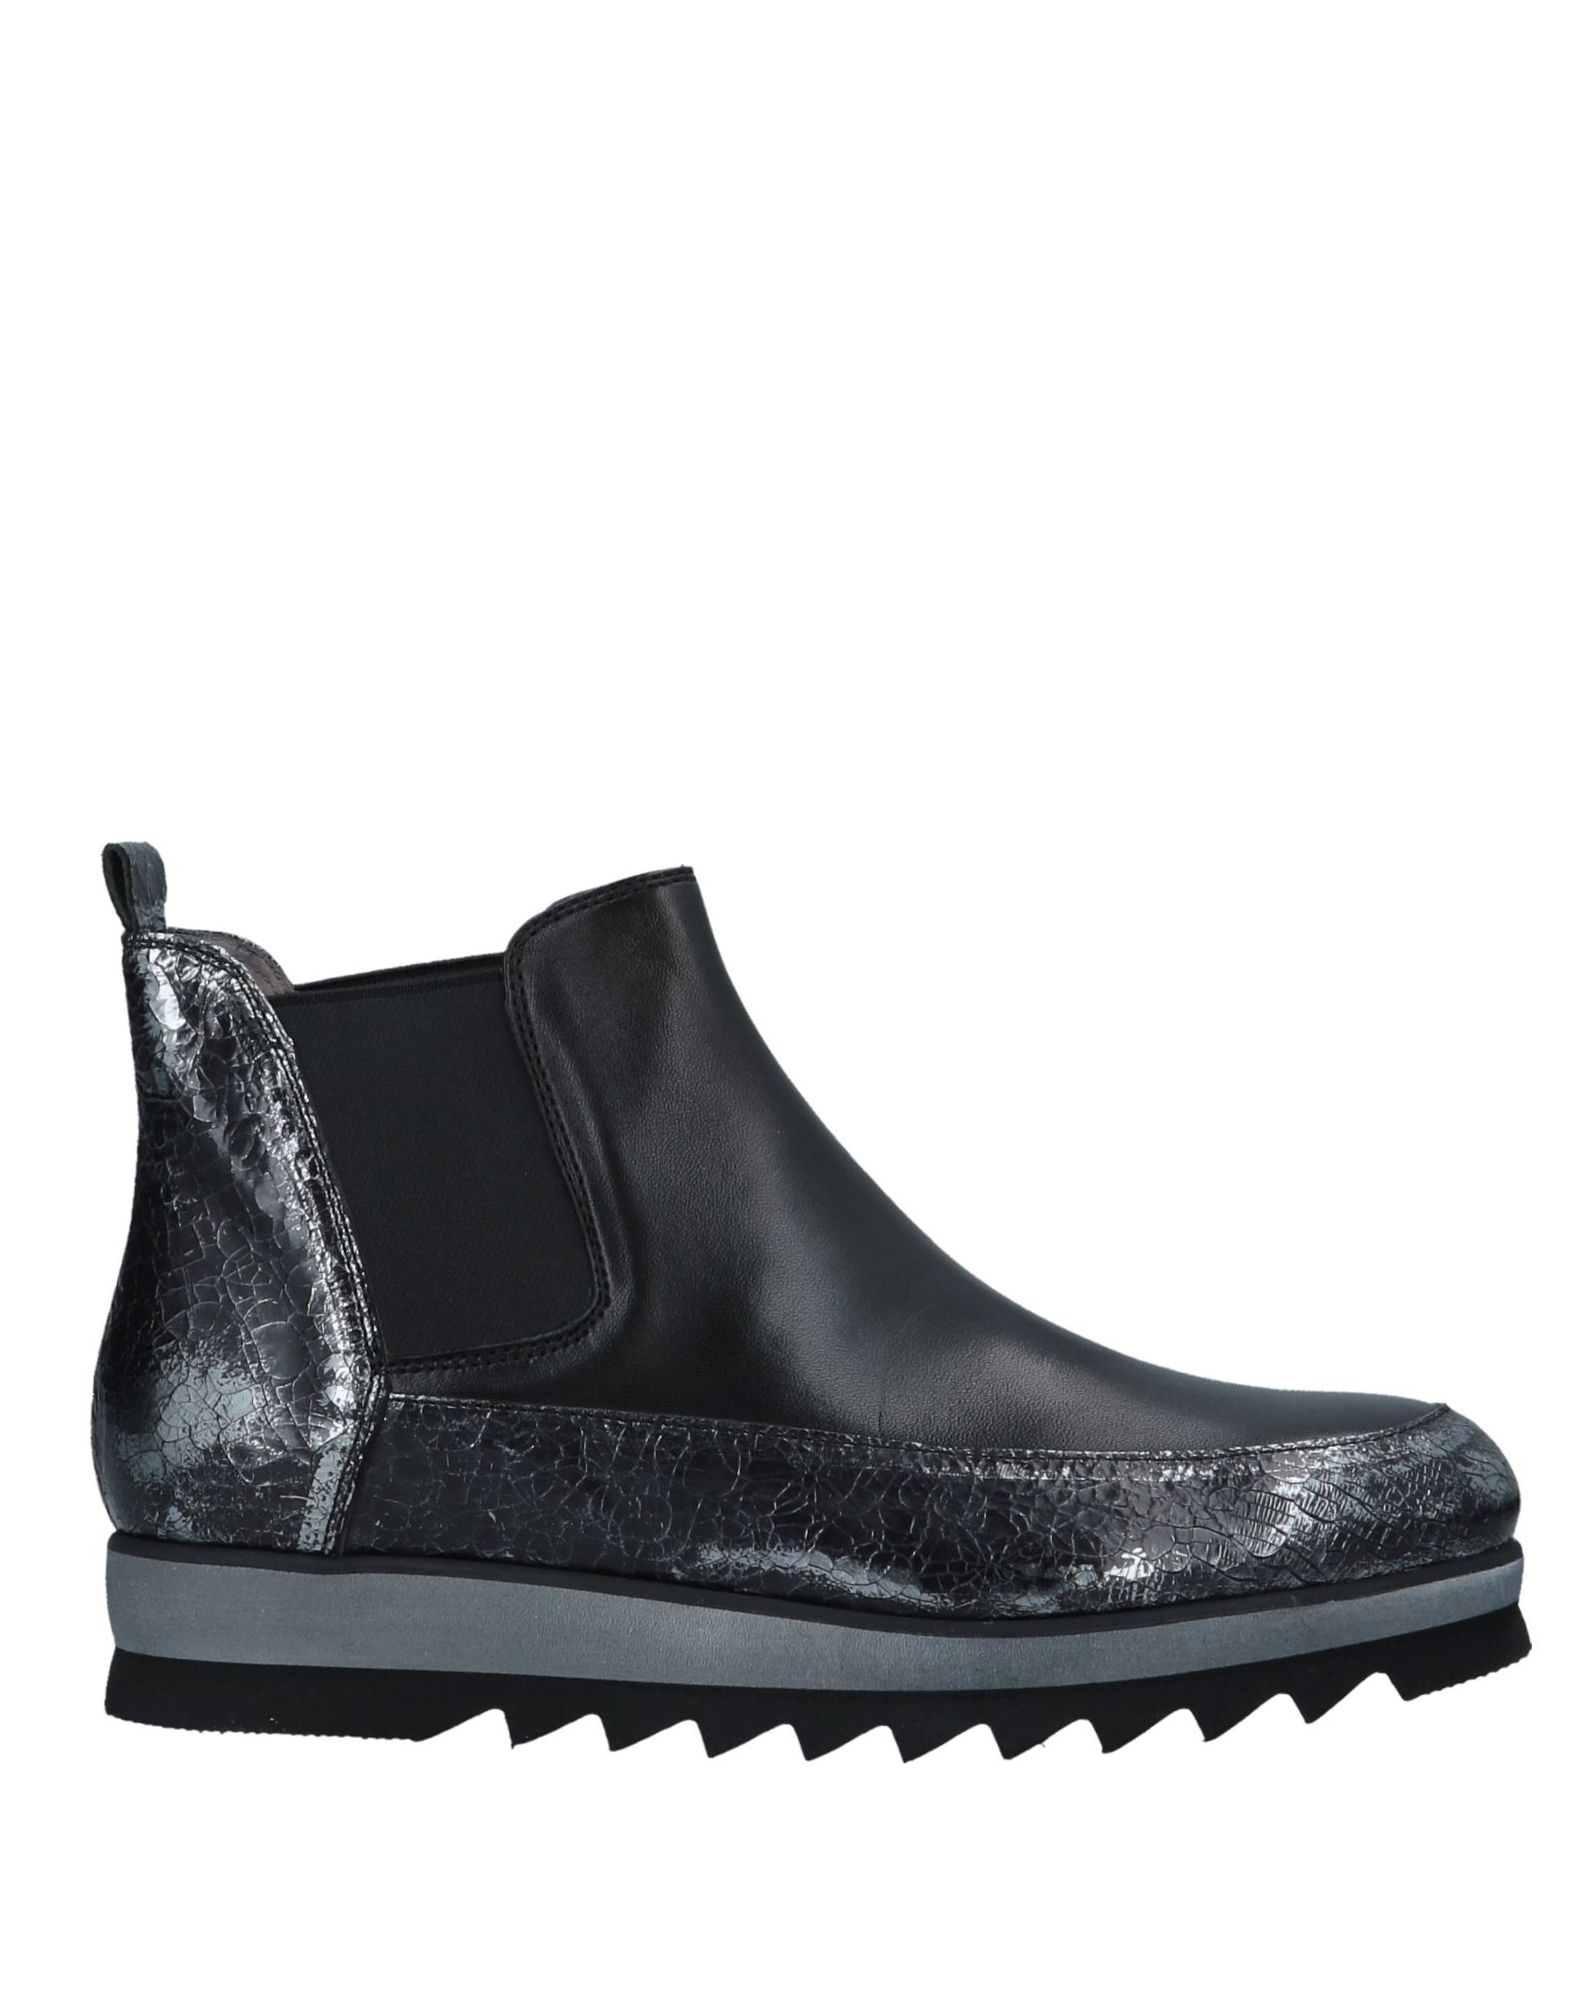 OIM by SILVANA LAURI Полусапоги и высокие ботинки lauri robinson saving marina